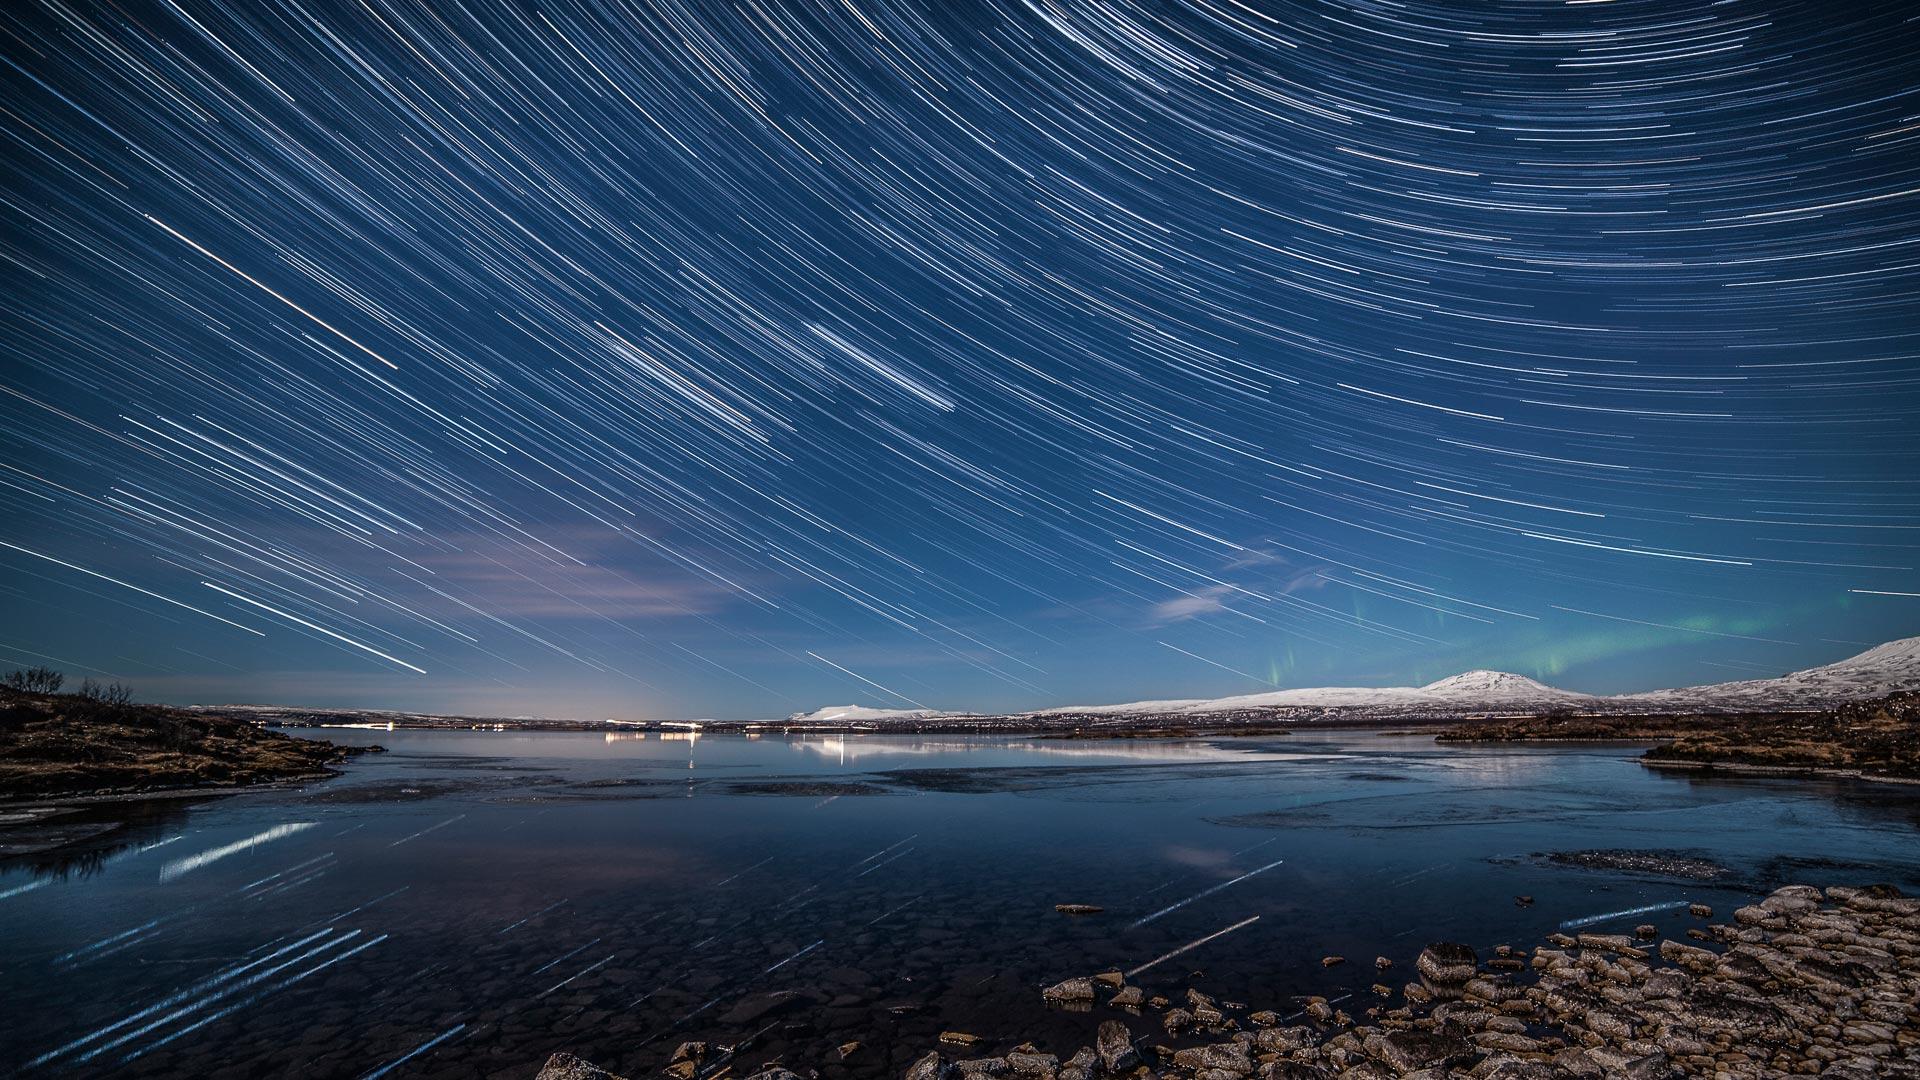 Stars Trails And Aurora Borealis Over 222 Ingvellir